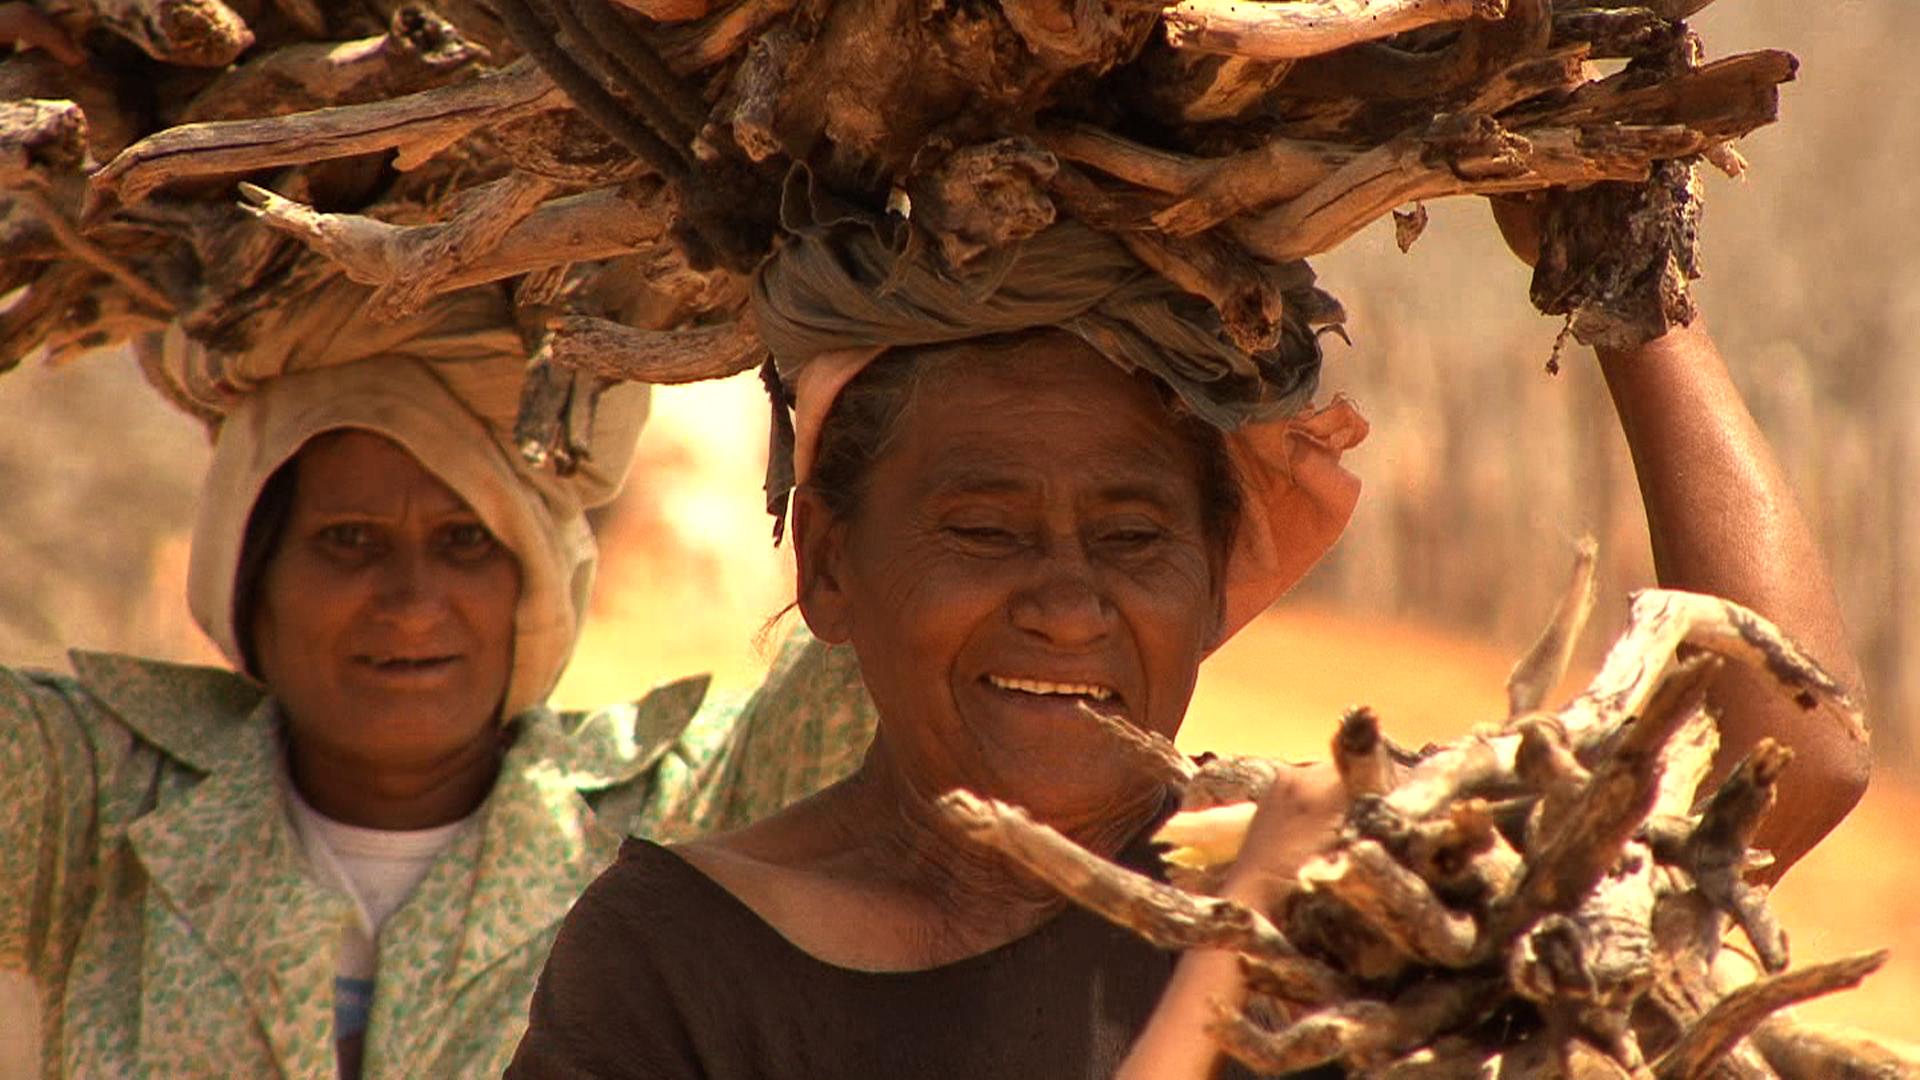 Movie still from The Sea of pilgrim Antonio : Otacila (70) brings wood home